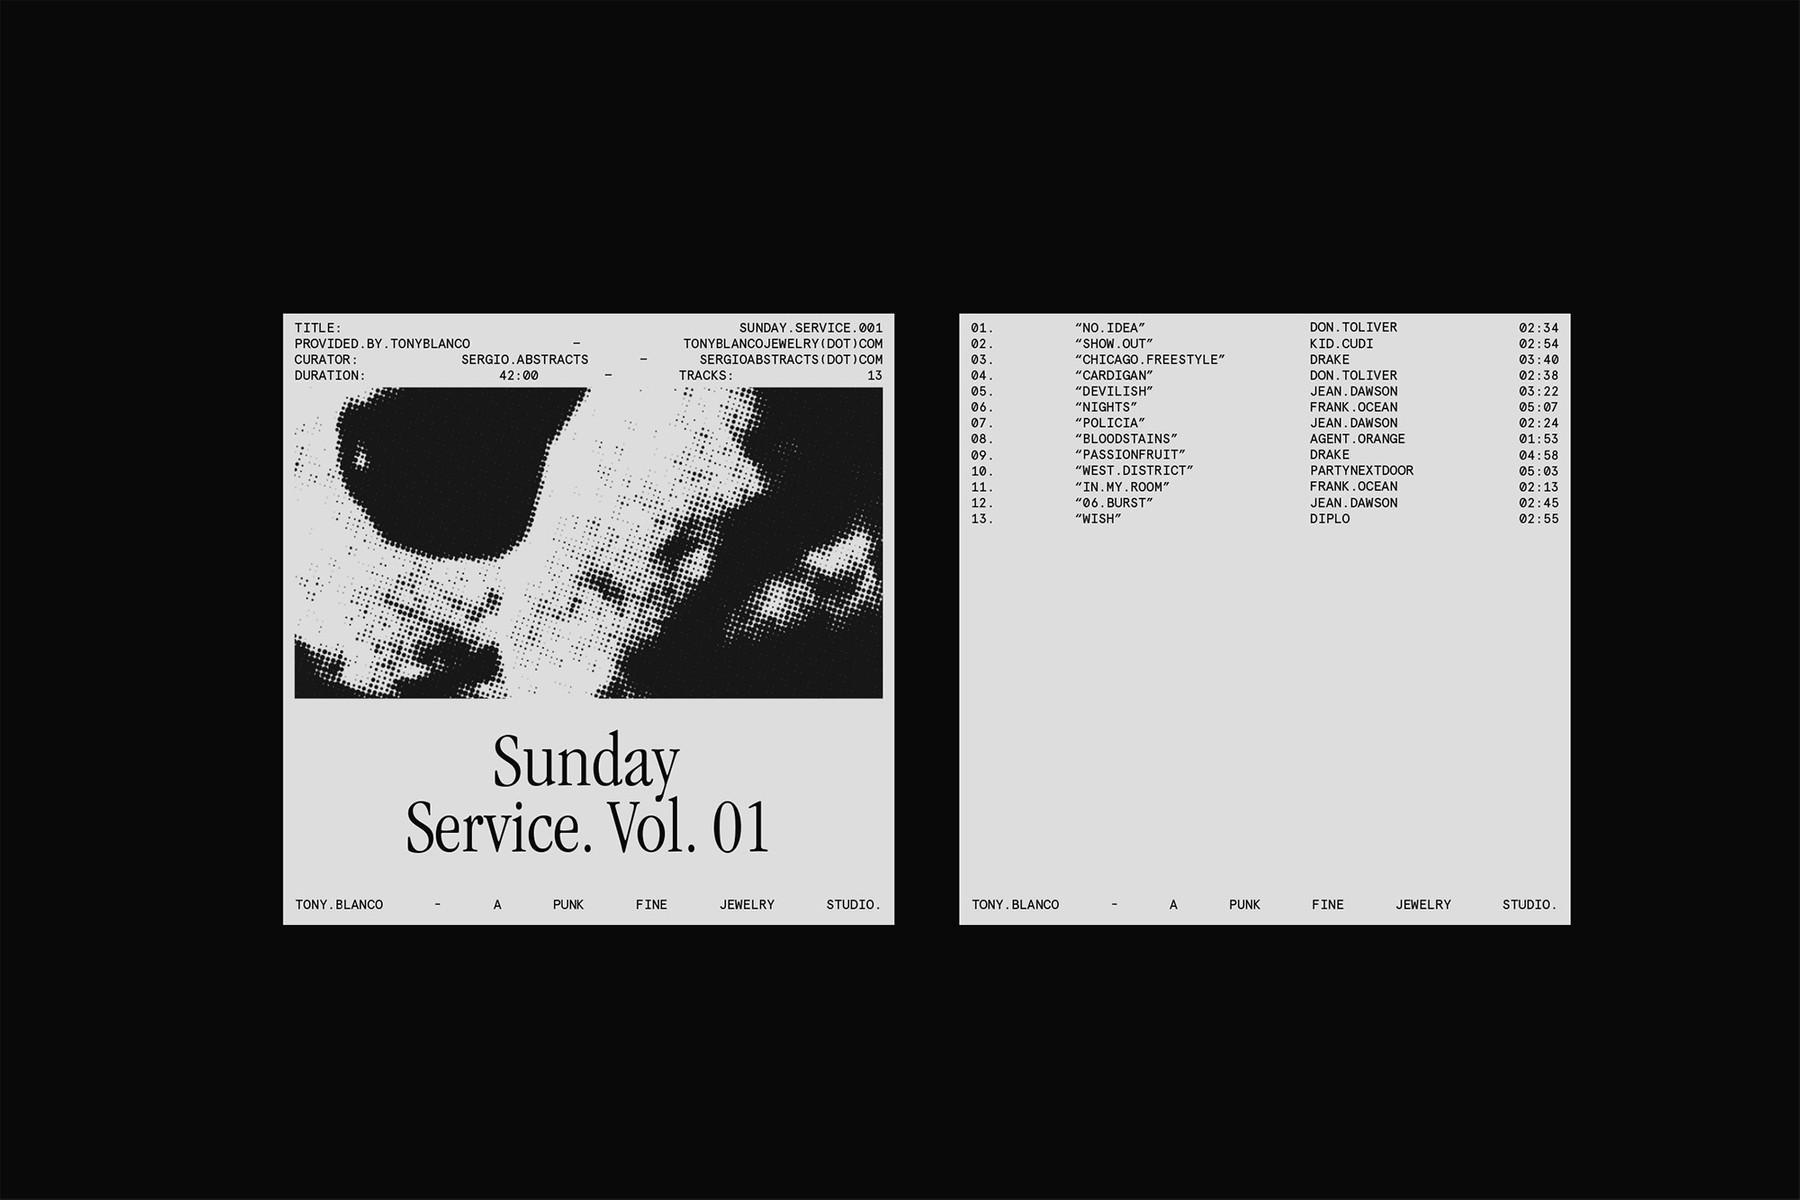 tonyblanco-sergioabstracts-7.jpg